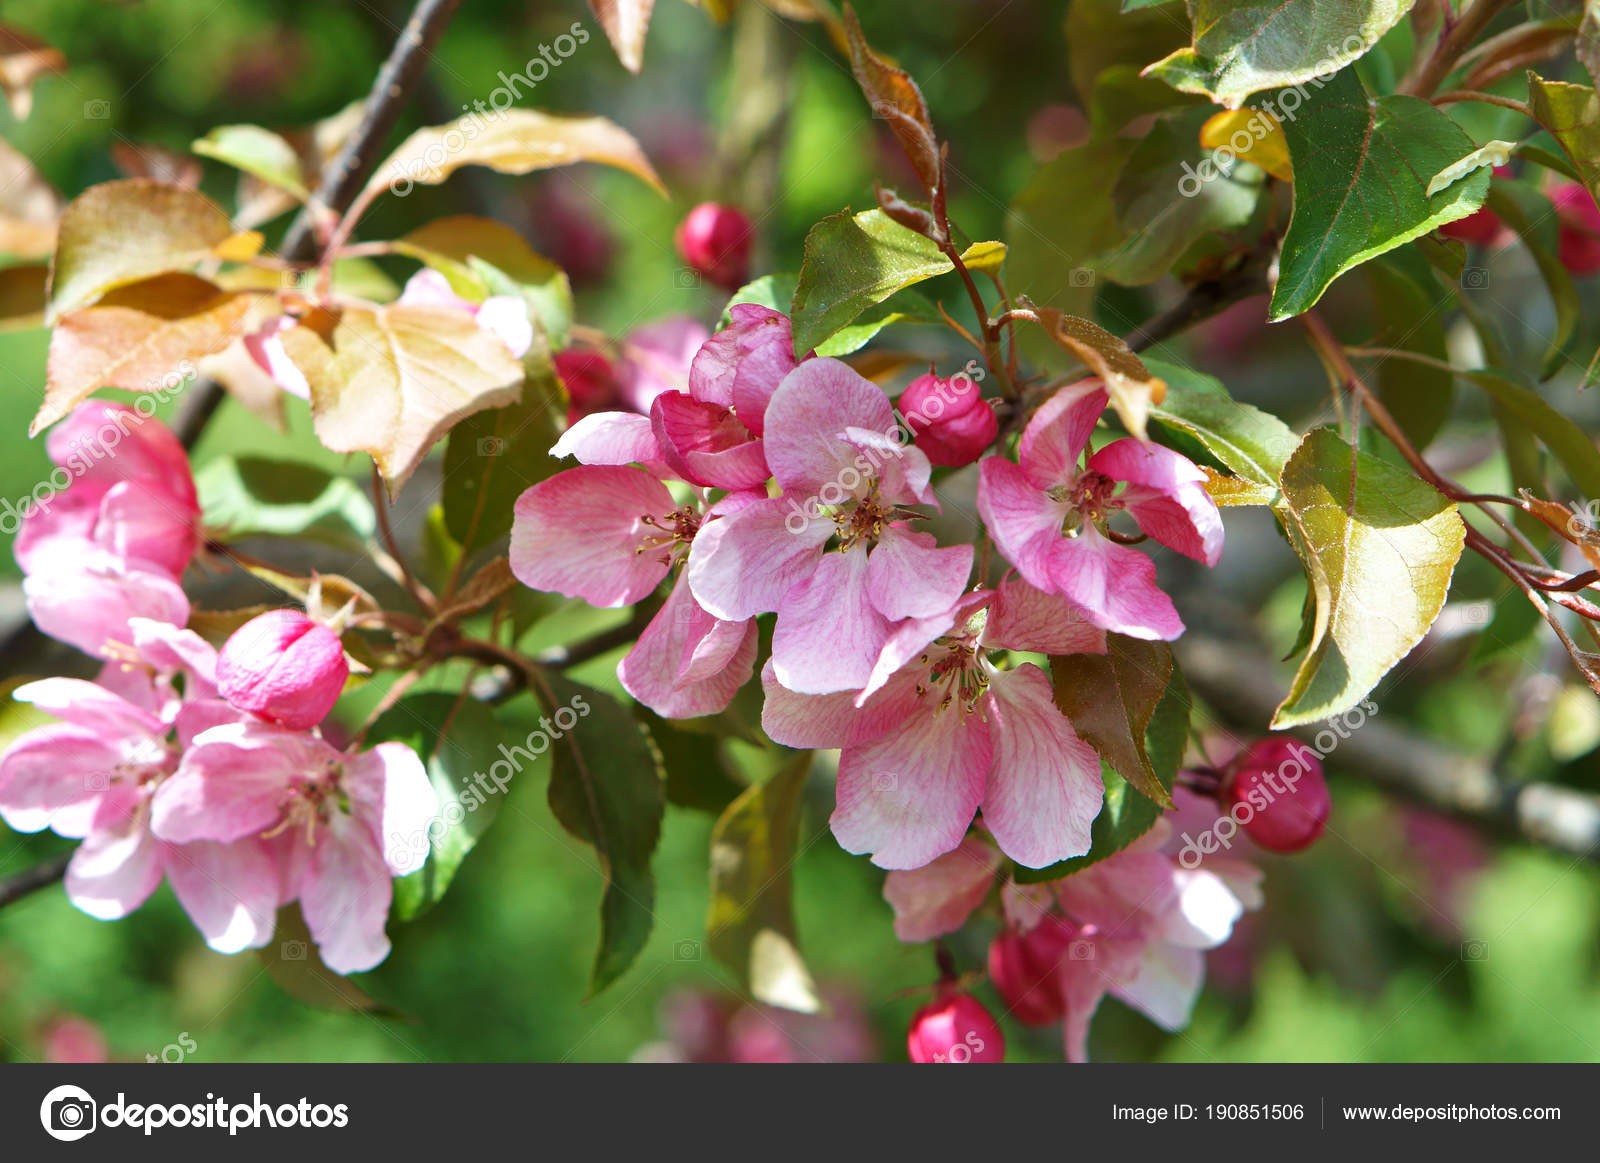 Flowering Trees Spring Pink Apple Flowers Pink Flowers Tree Branches